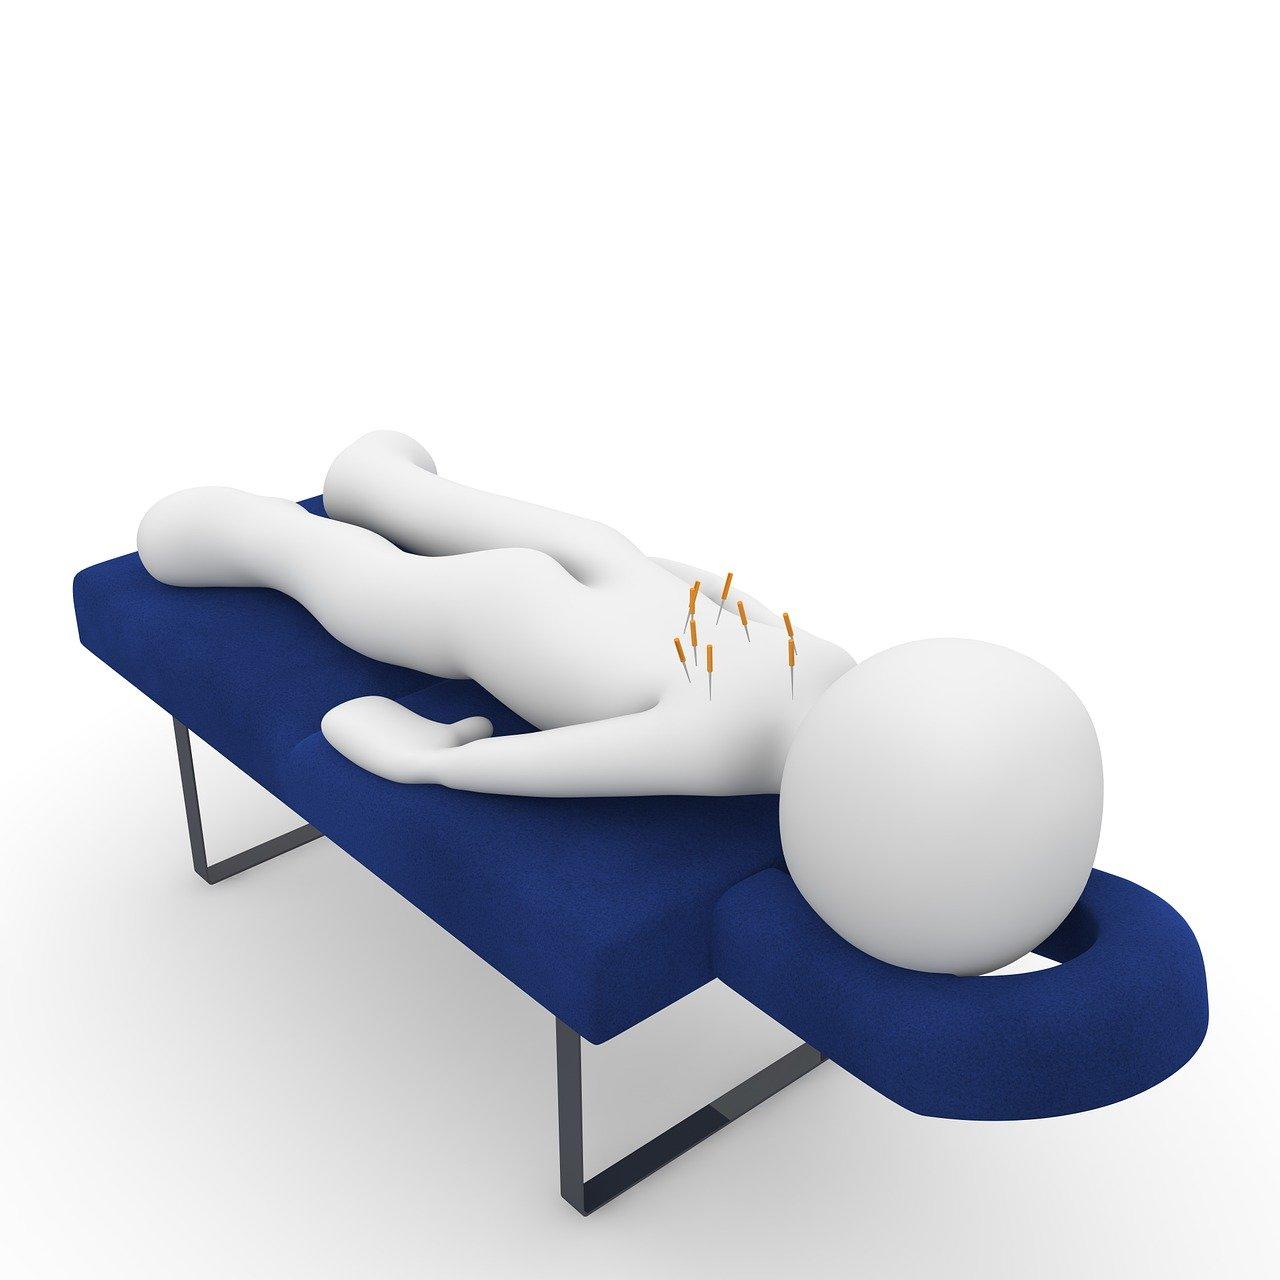 Foesenek C J A Fysio/manueeltherapeut physiotherapie